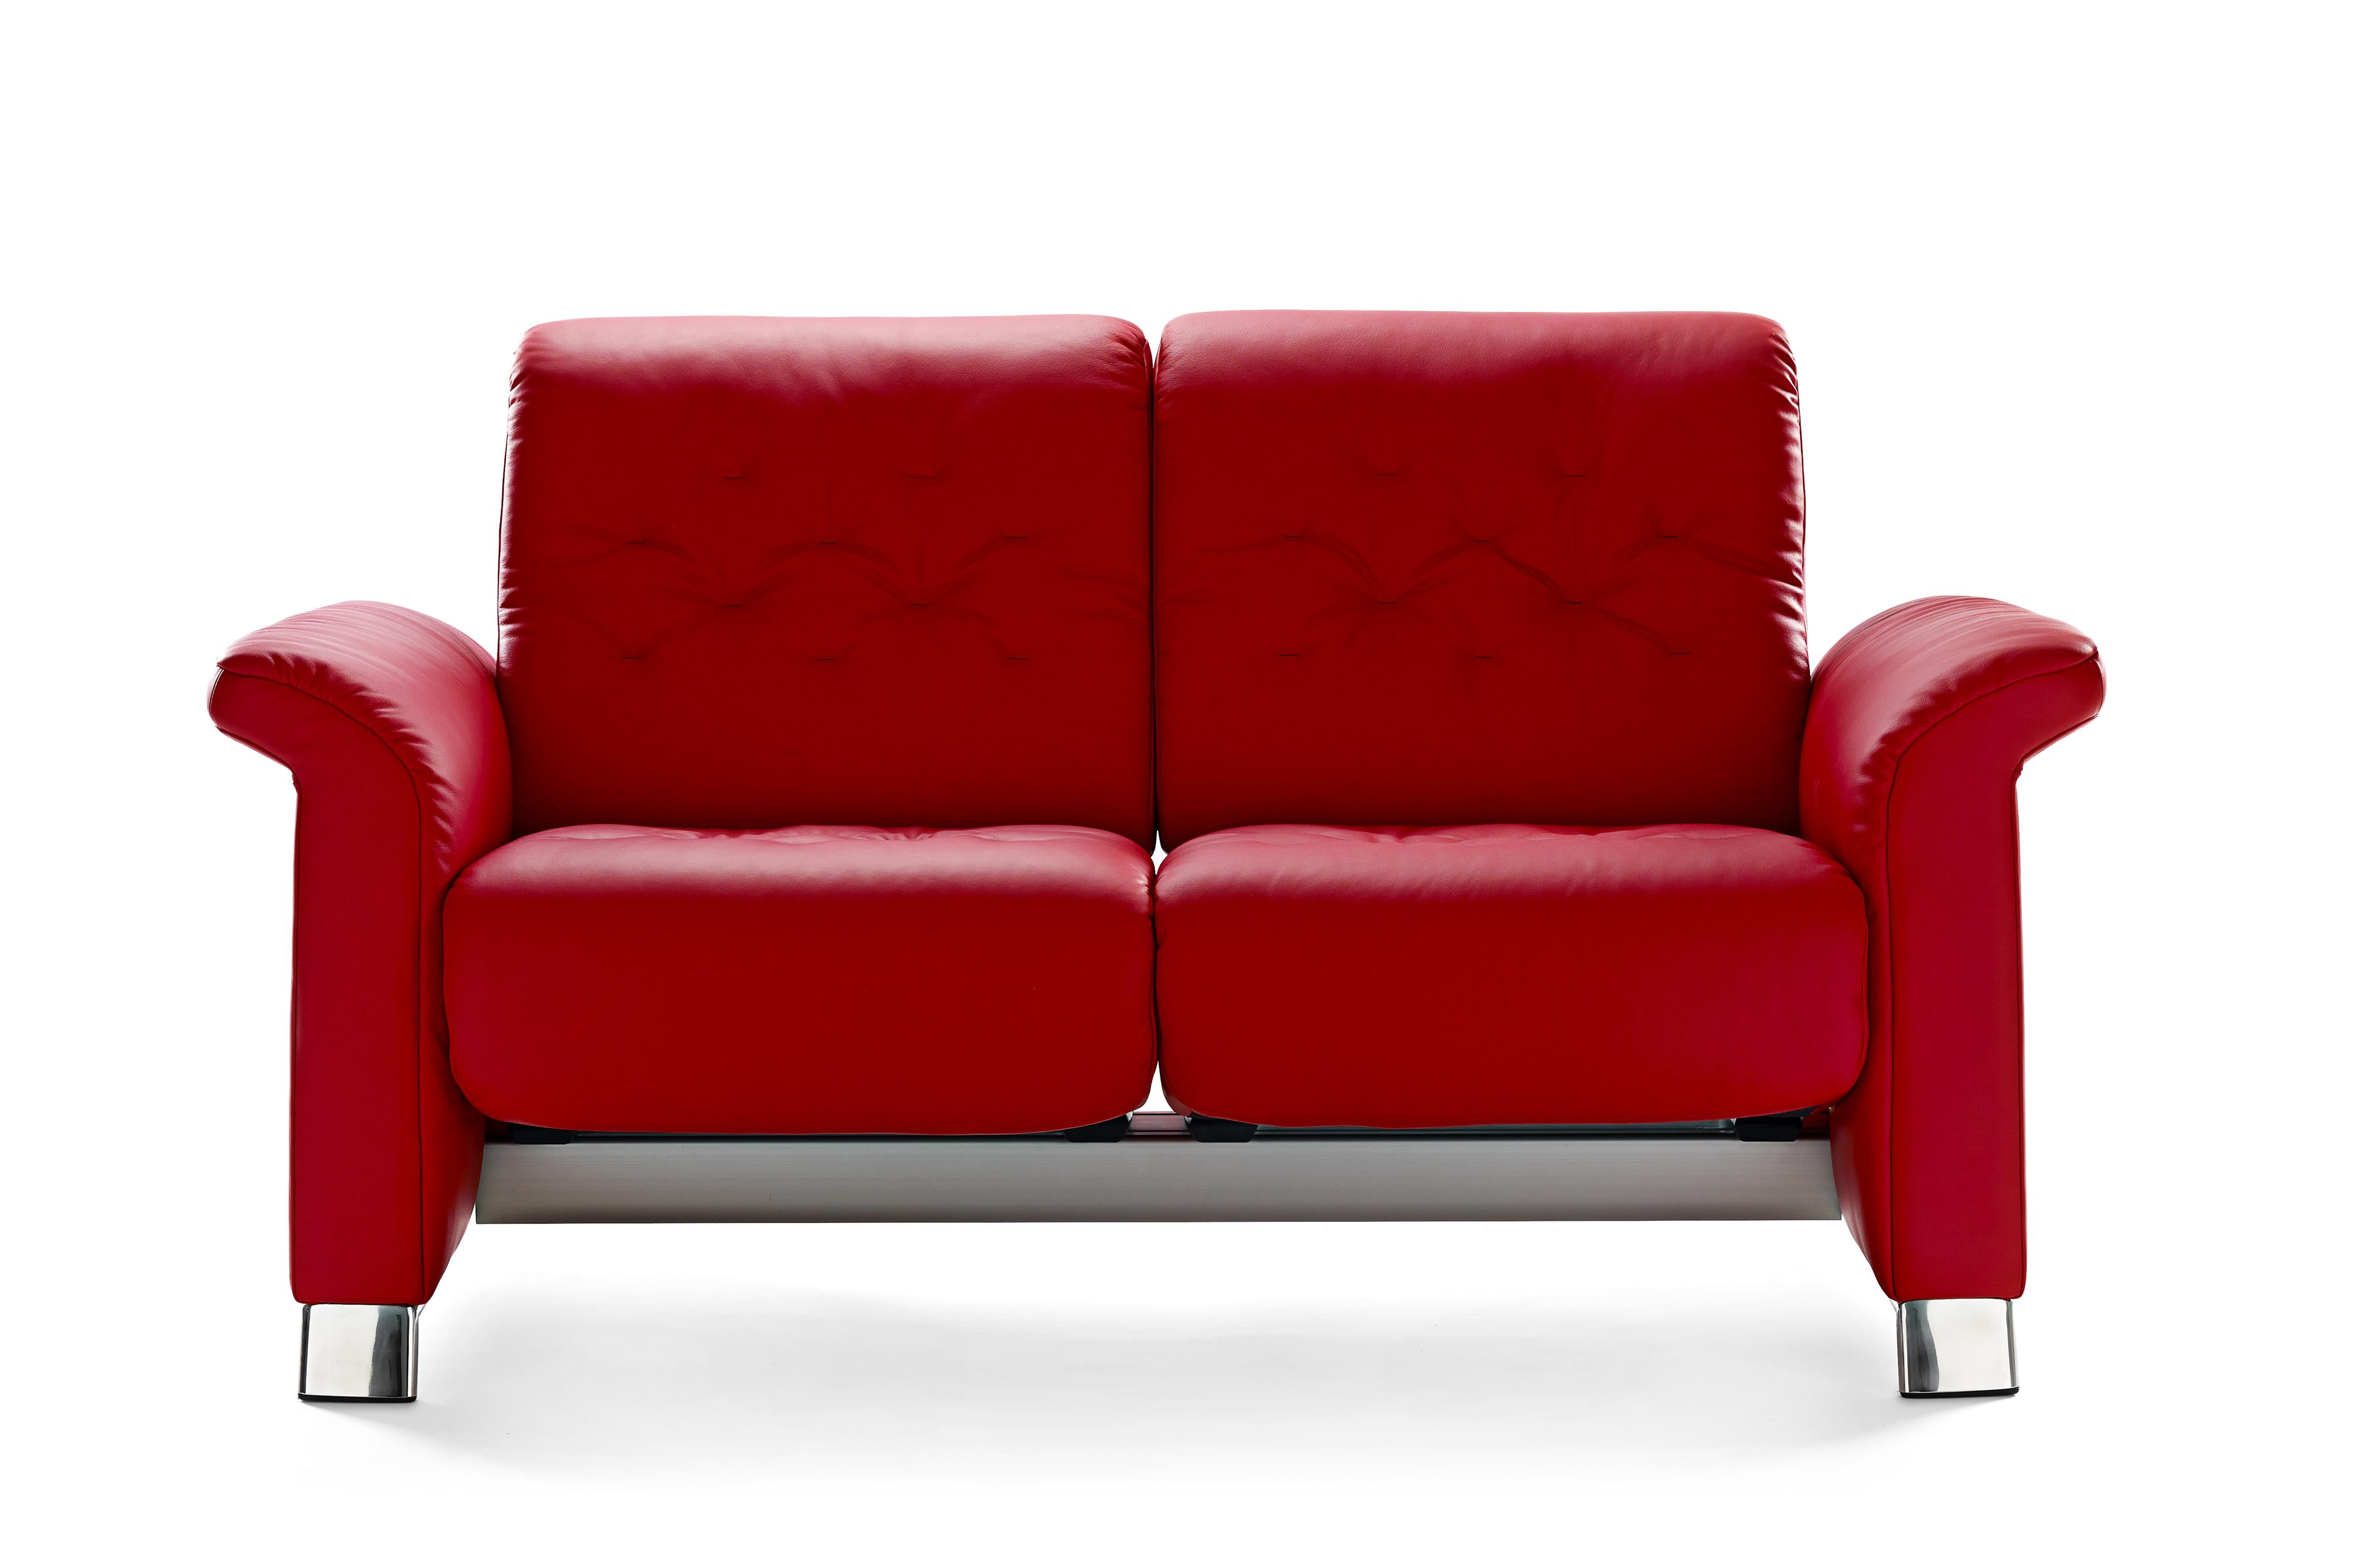 Stressless By Ekornes Stressless Metropolitan Contemporary 2 Seater Sofa Conlin 39 S Furniture